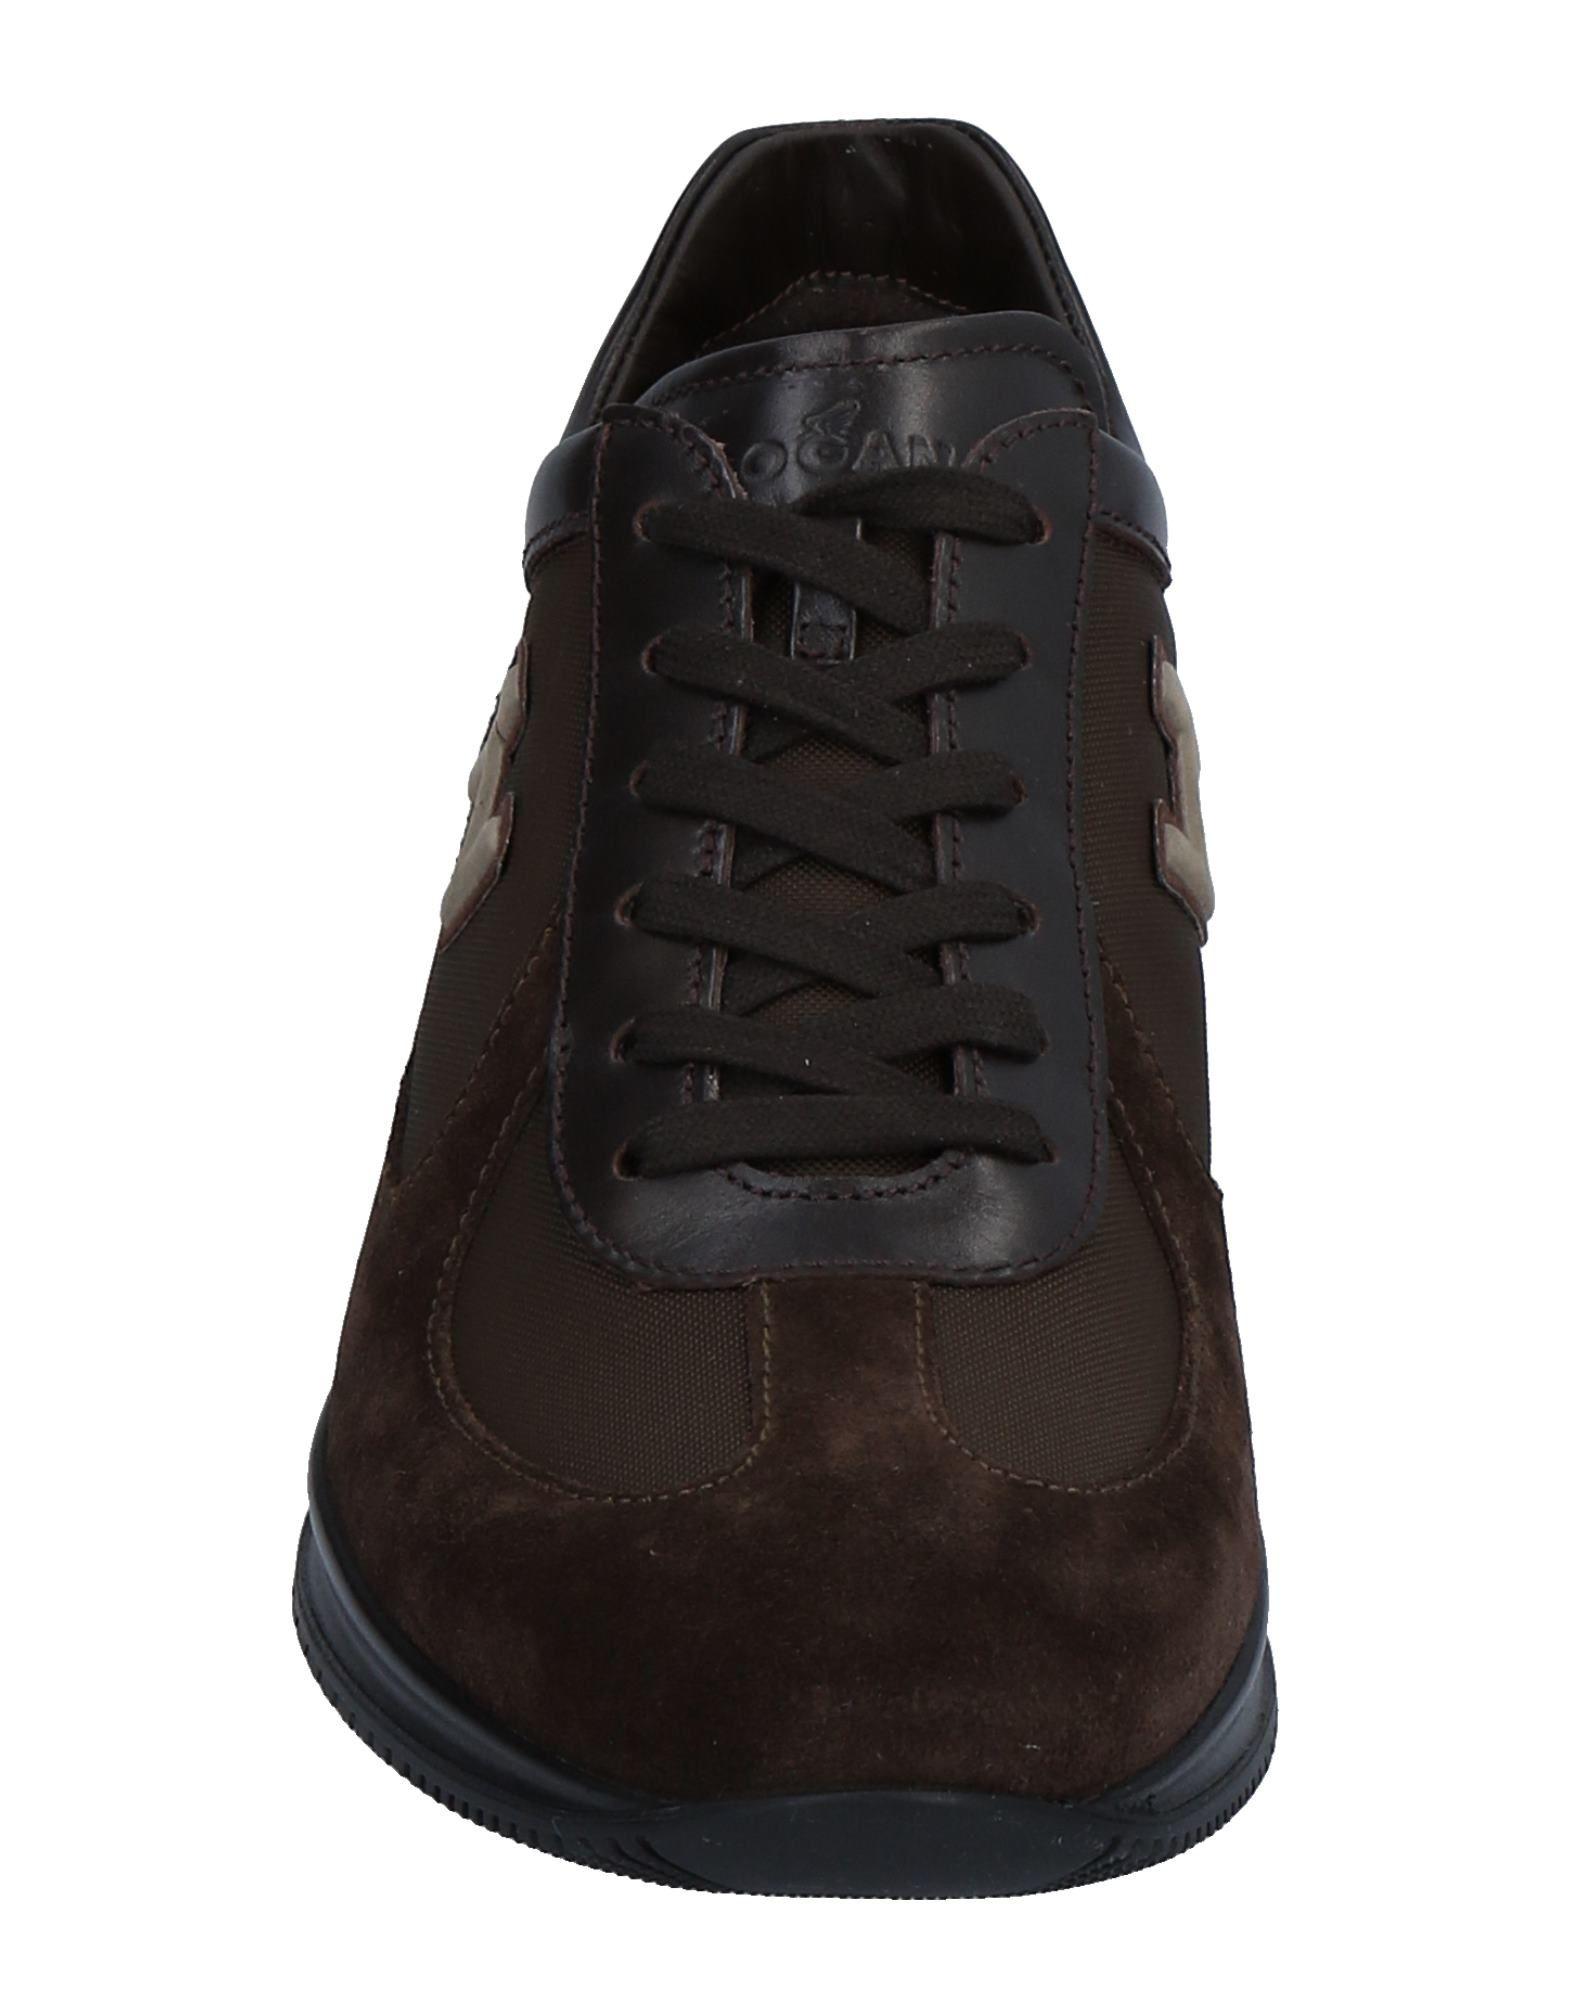 Hogan 11516155PJ Sneakers Herren  11516155PJ Hogan 21f5b6